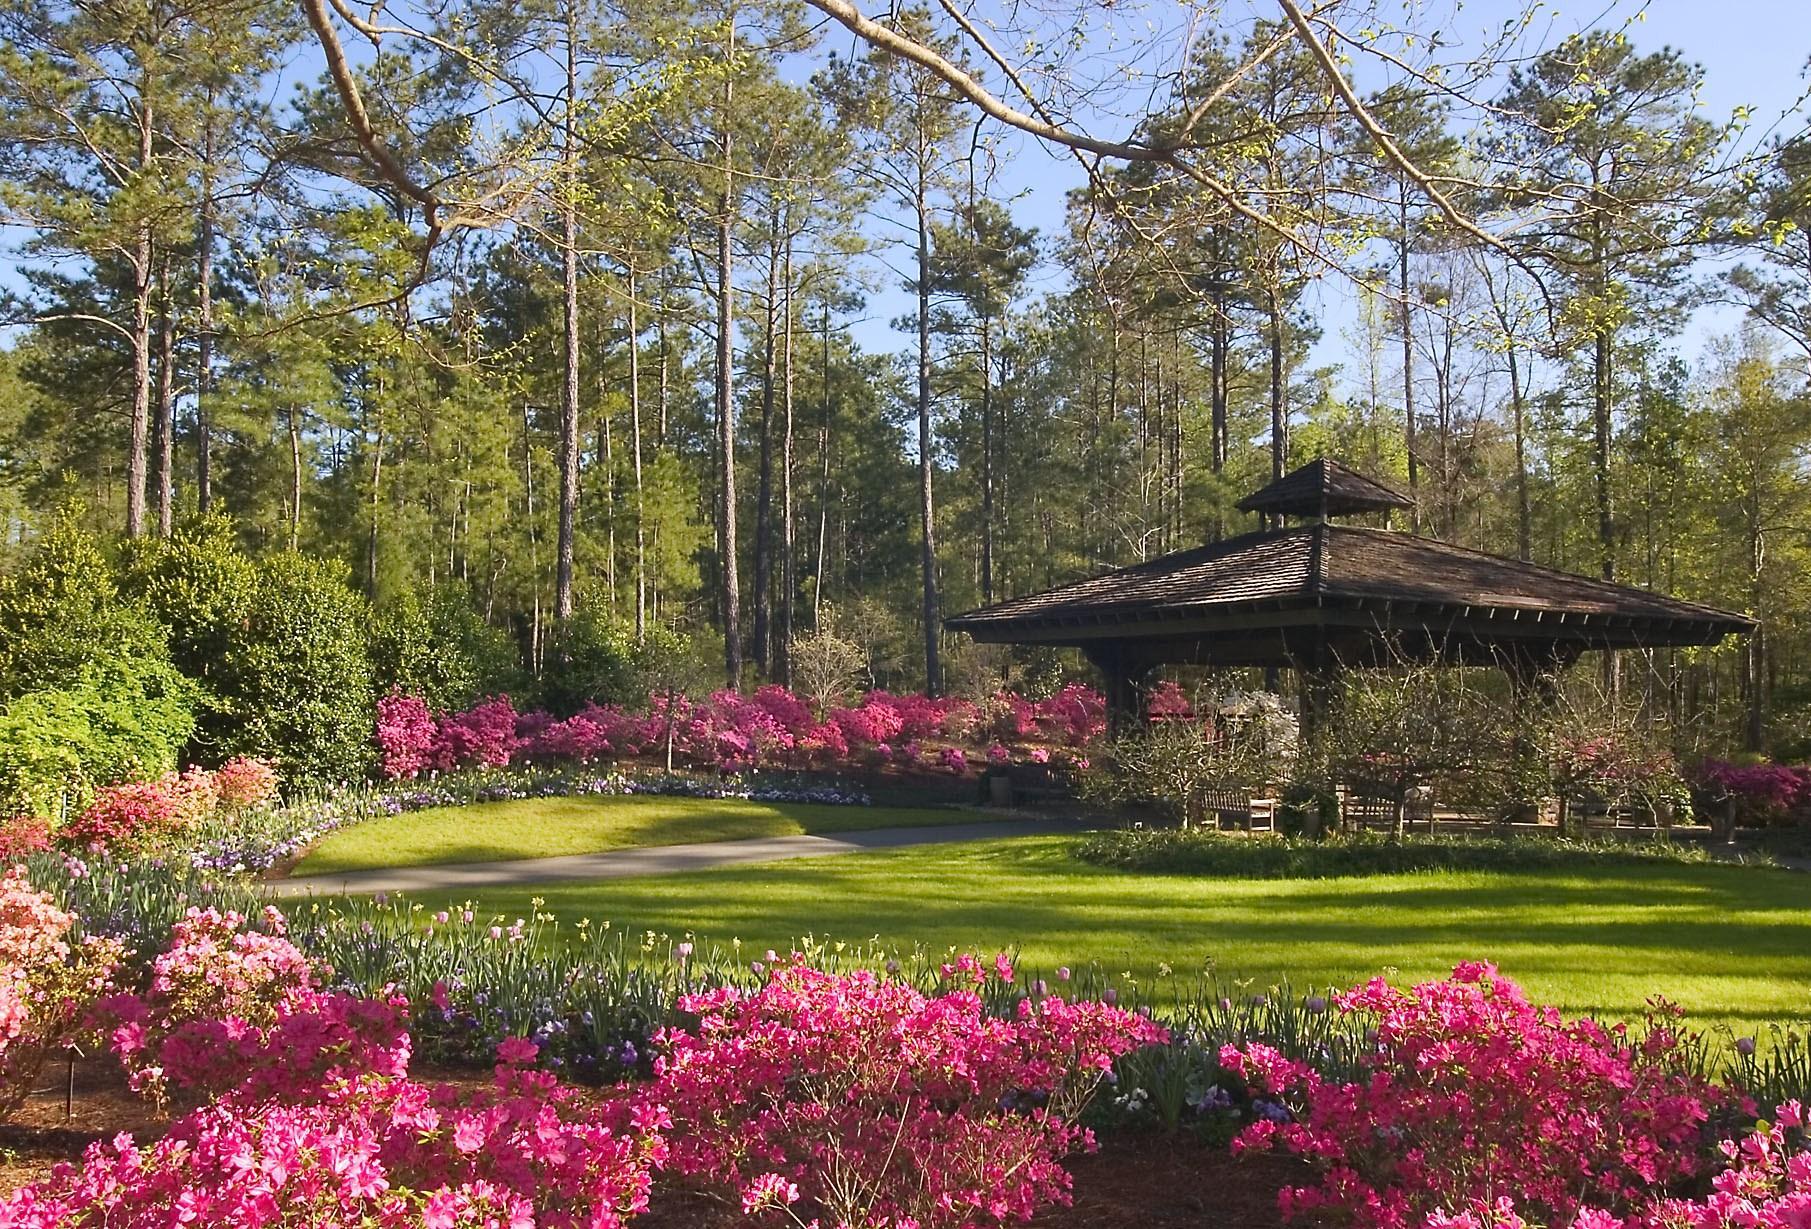 callaway home slider hotels values big cobblestone gardens town quality city near small garden